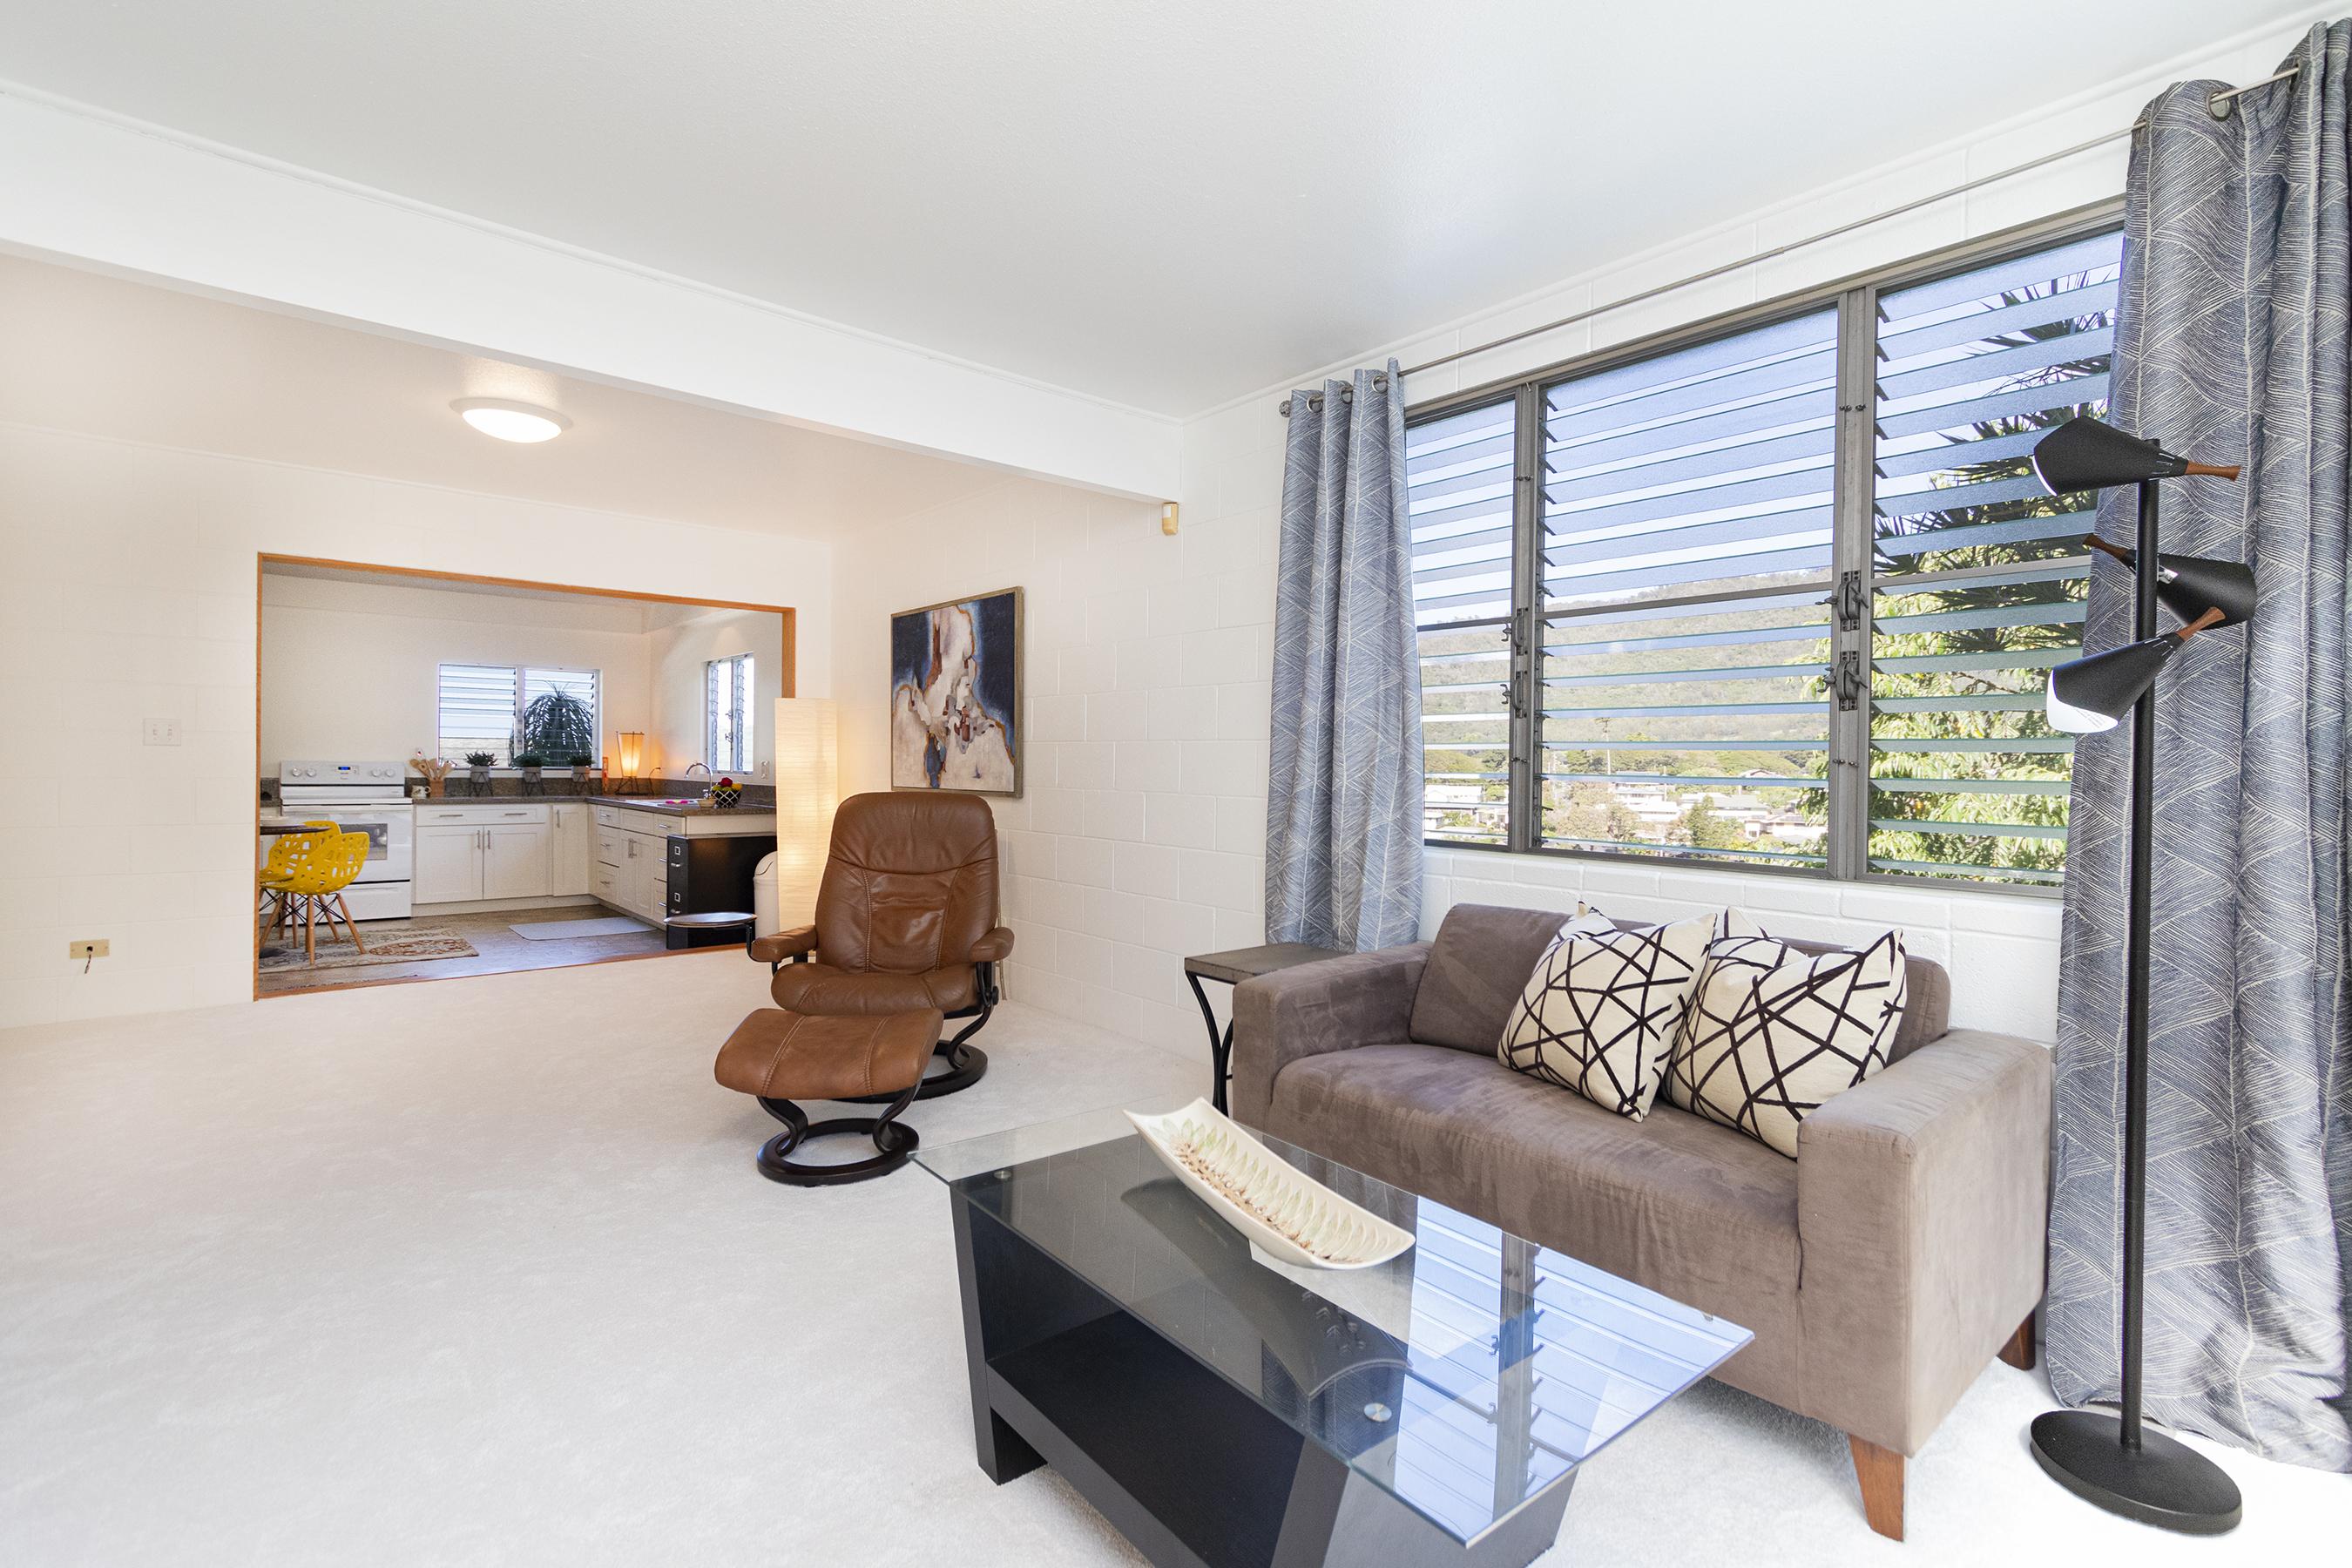 Downstairs Living Area at 380 Puiwa Road, Honolulu, HI 96817